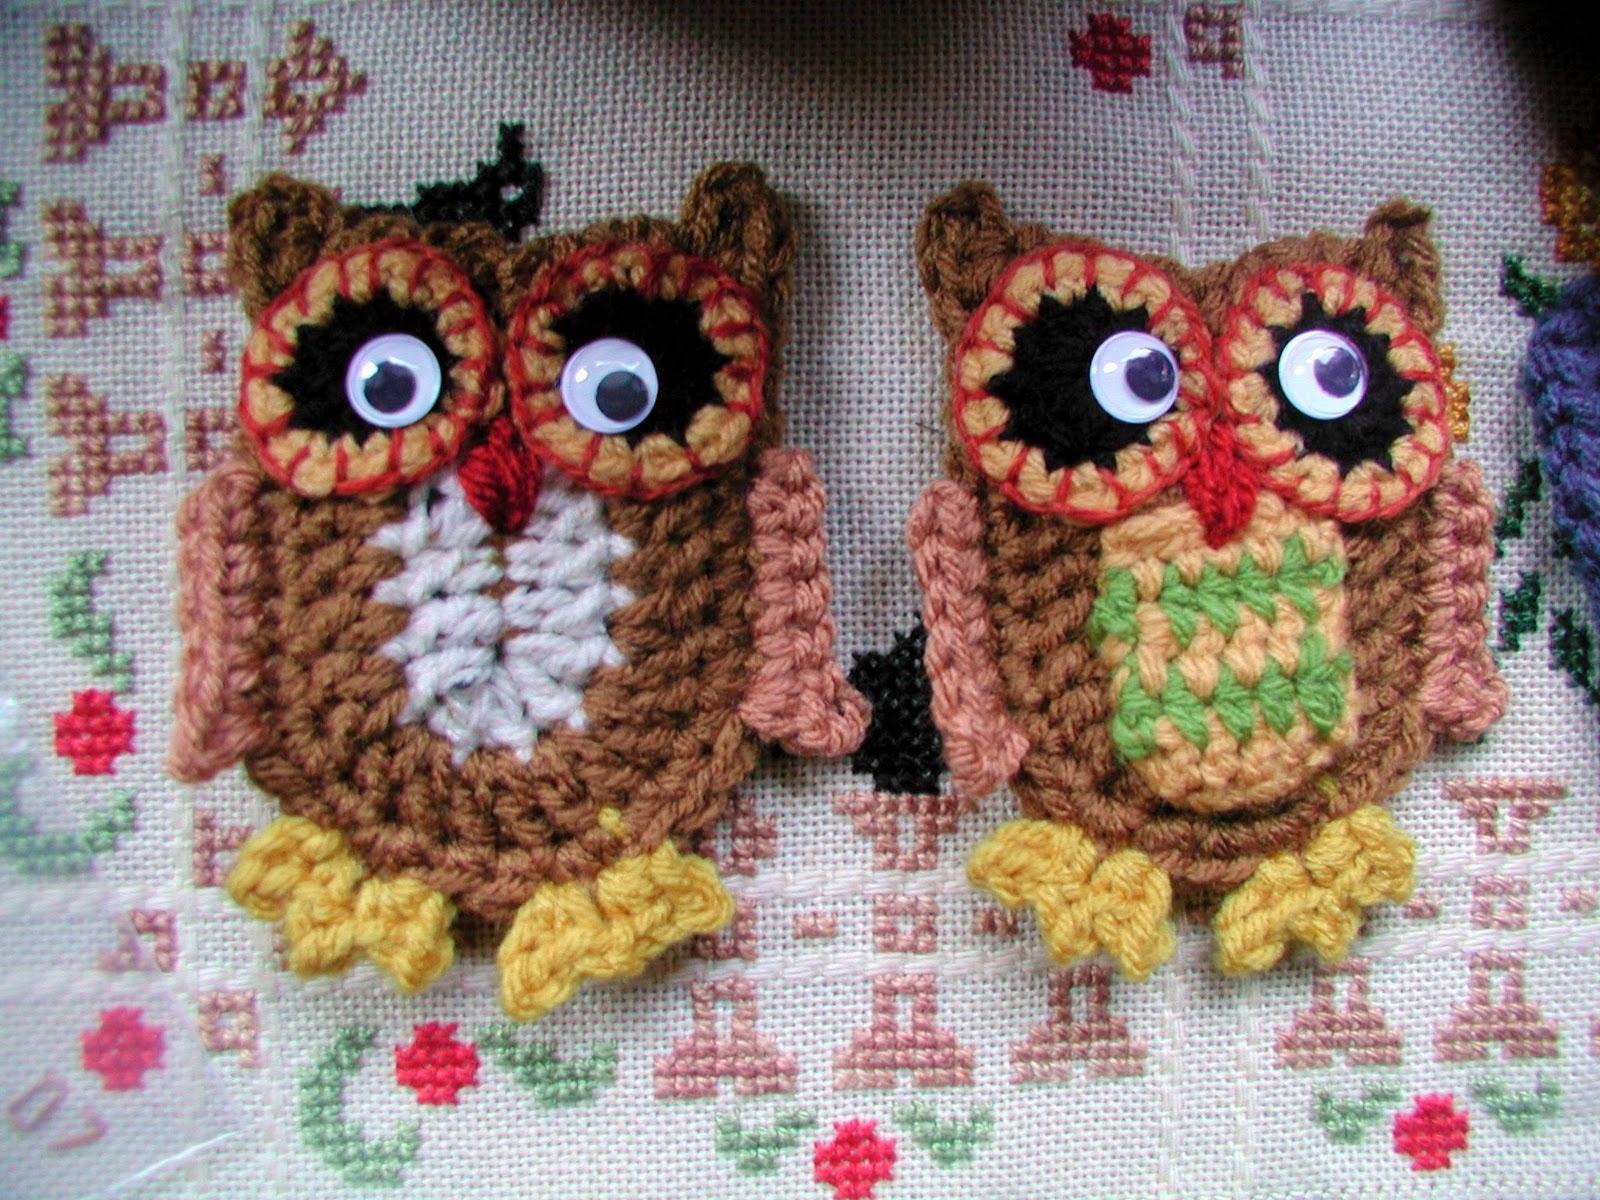 Fiddlesticks - My crochet and knitting ramblings.: Hootie ...